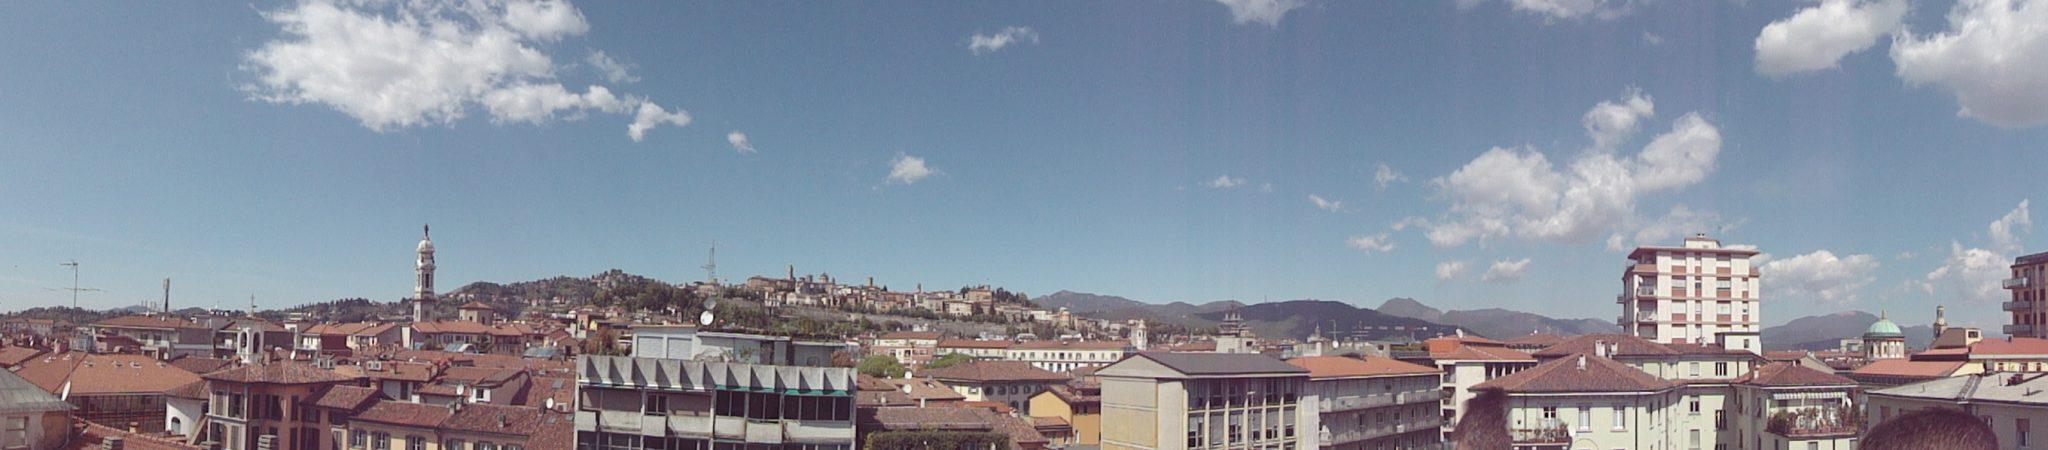 Bergamo Panorama Alex e Angie Hotel Marvellous Vista